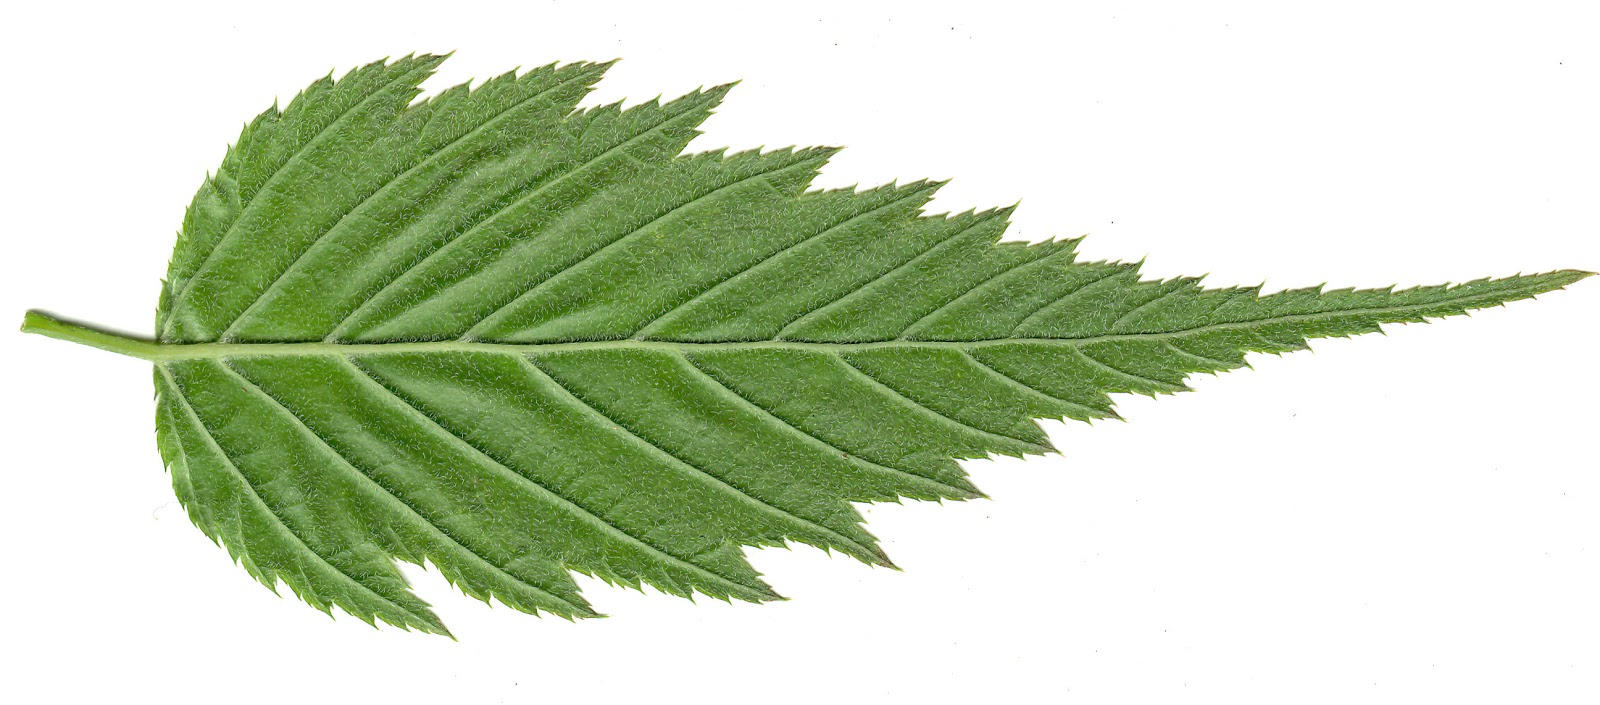 HIGH RESOLUTION SEAMLESS TEXTURES: Leaf Textures